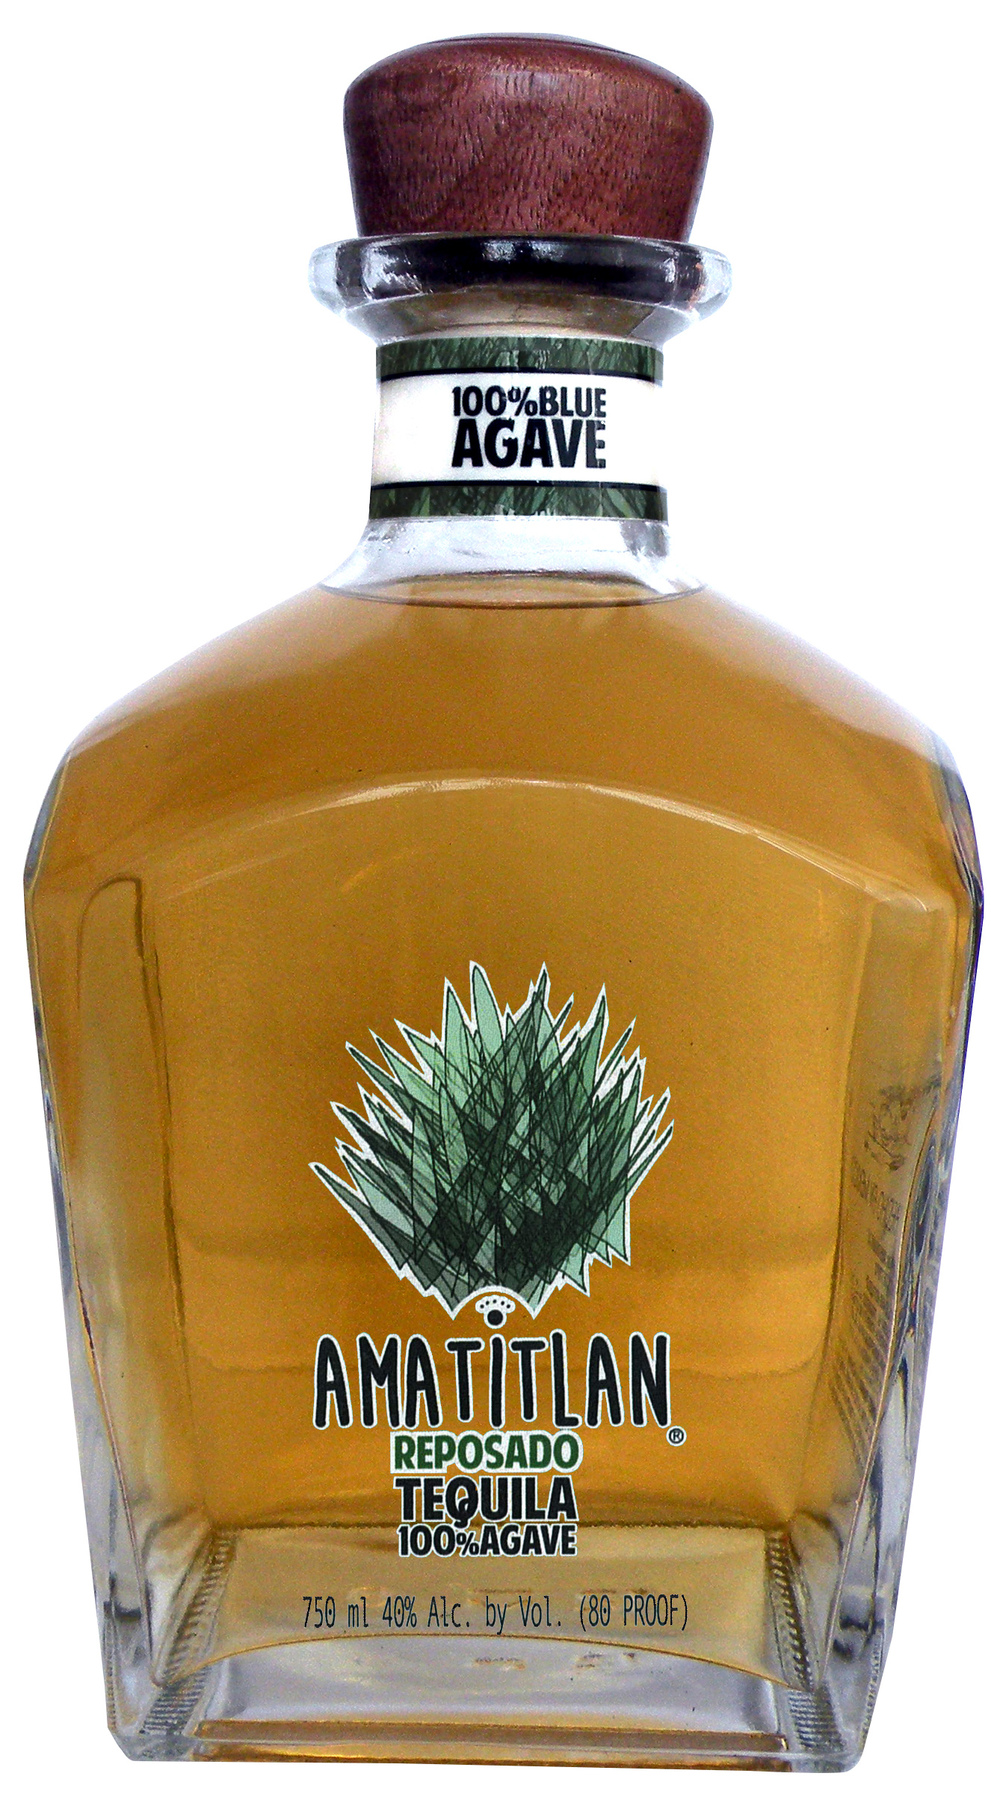 Tequila Amatitlan Reposado 750 ml £48.50